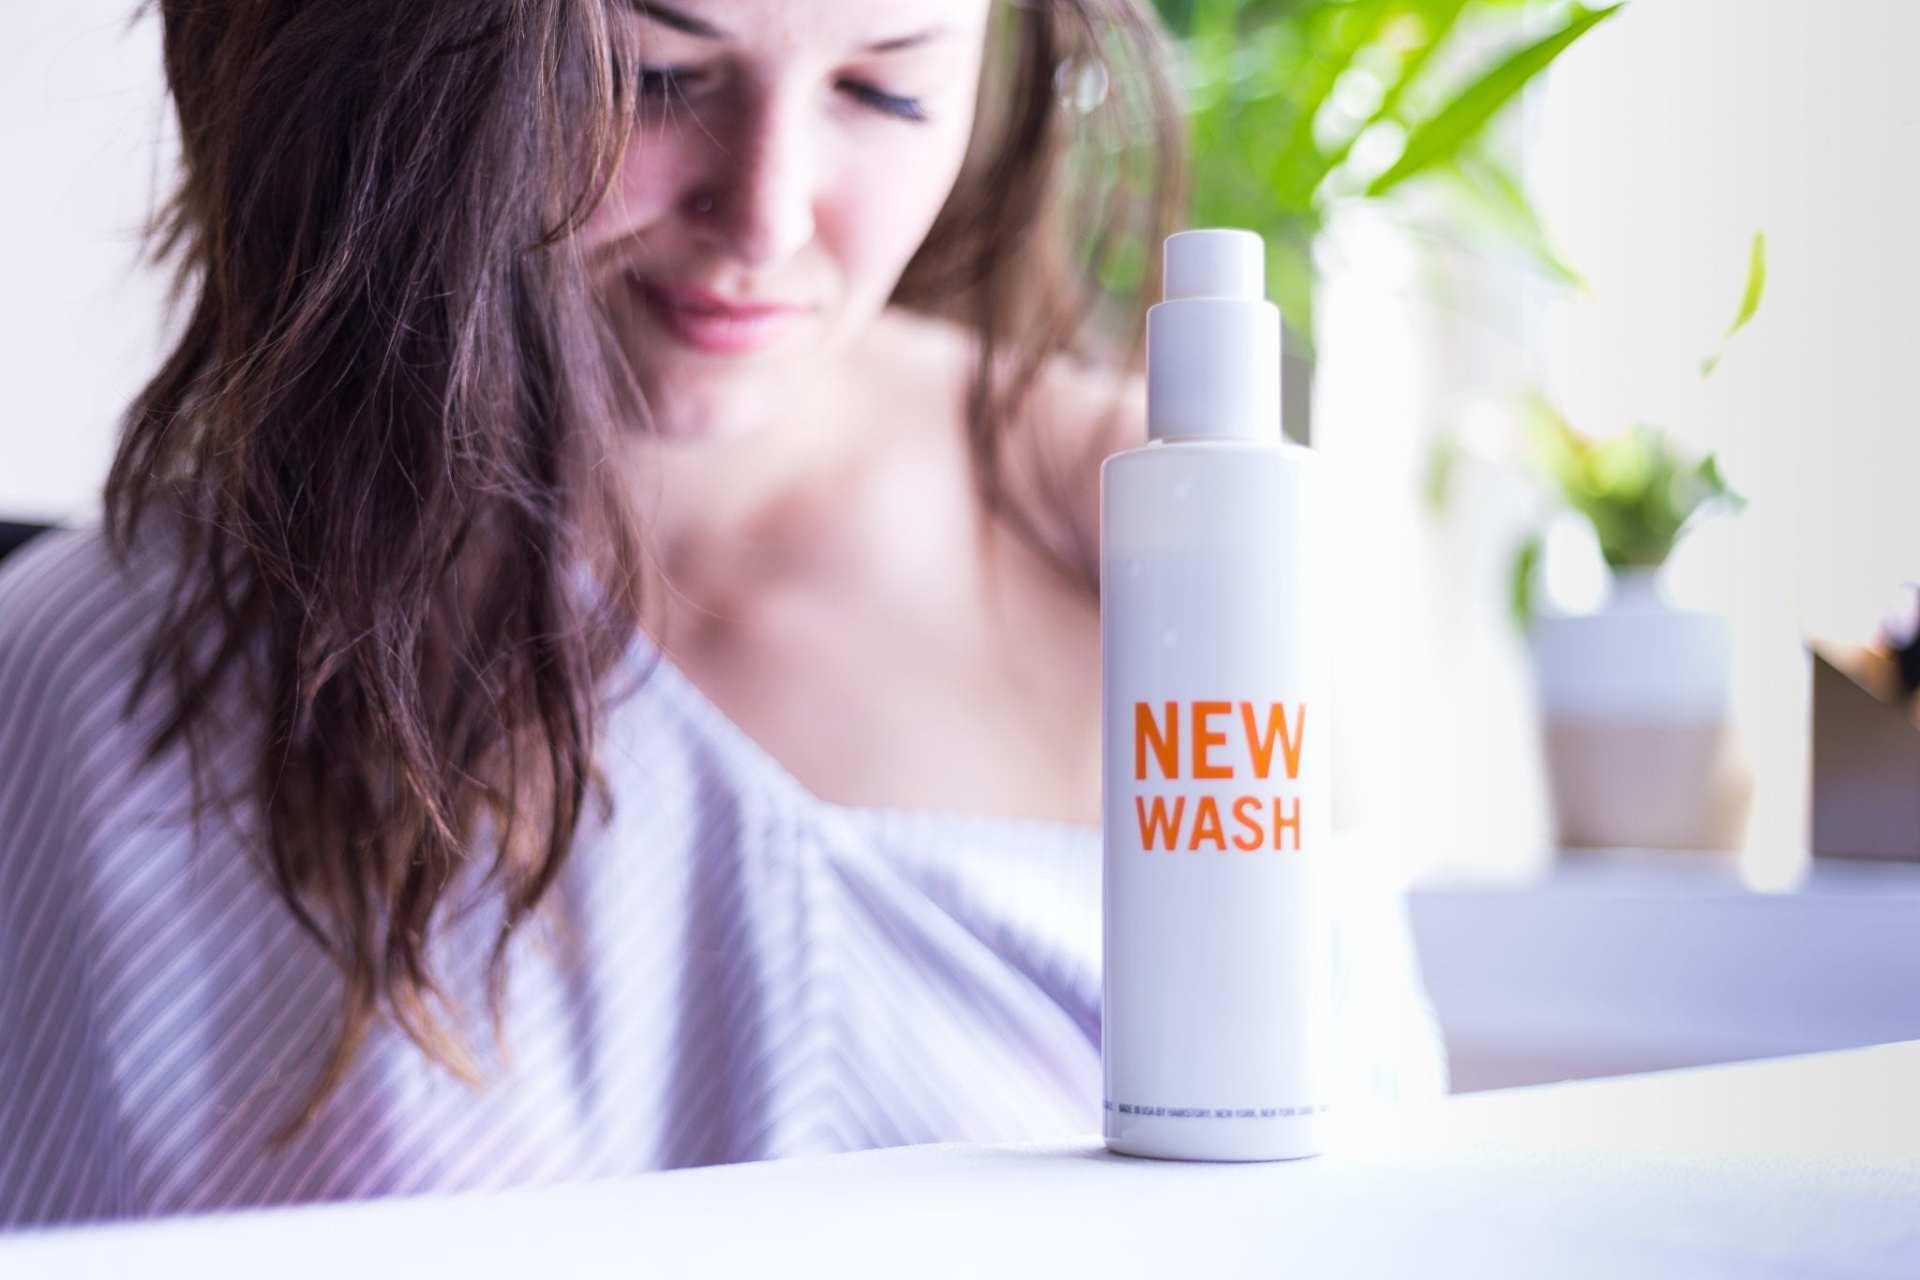 new wash   shampoo   all in one   sud free shampoo   nopoo   hair care   best shampoo   best hair products   oil based shampoo   all in one shampoo and conditioner   hair repair